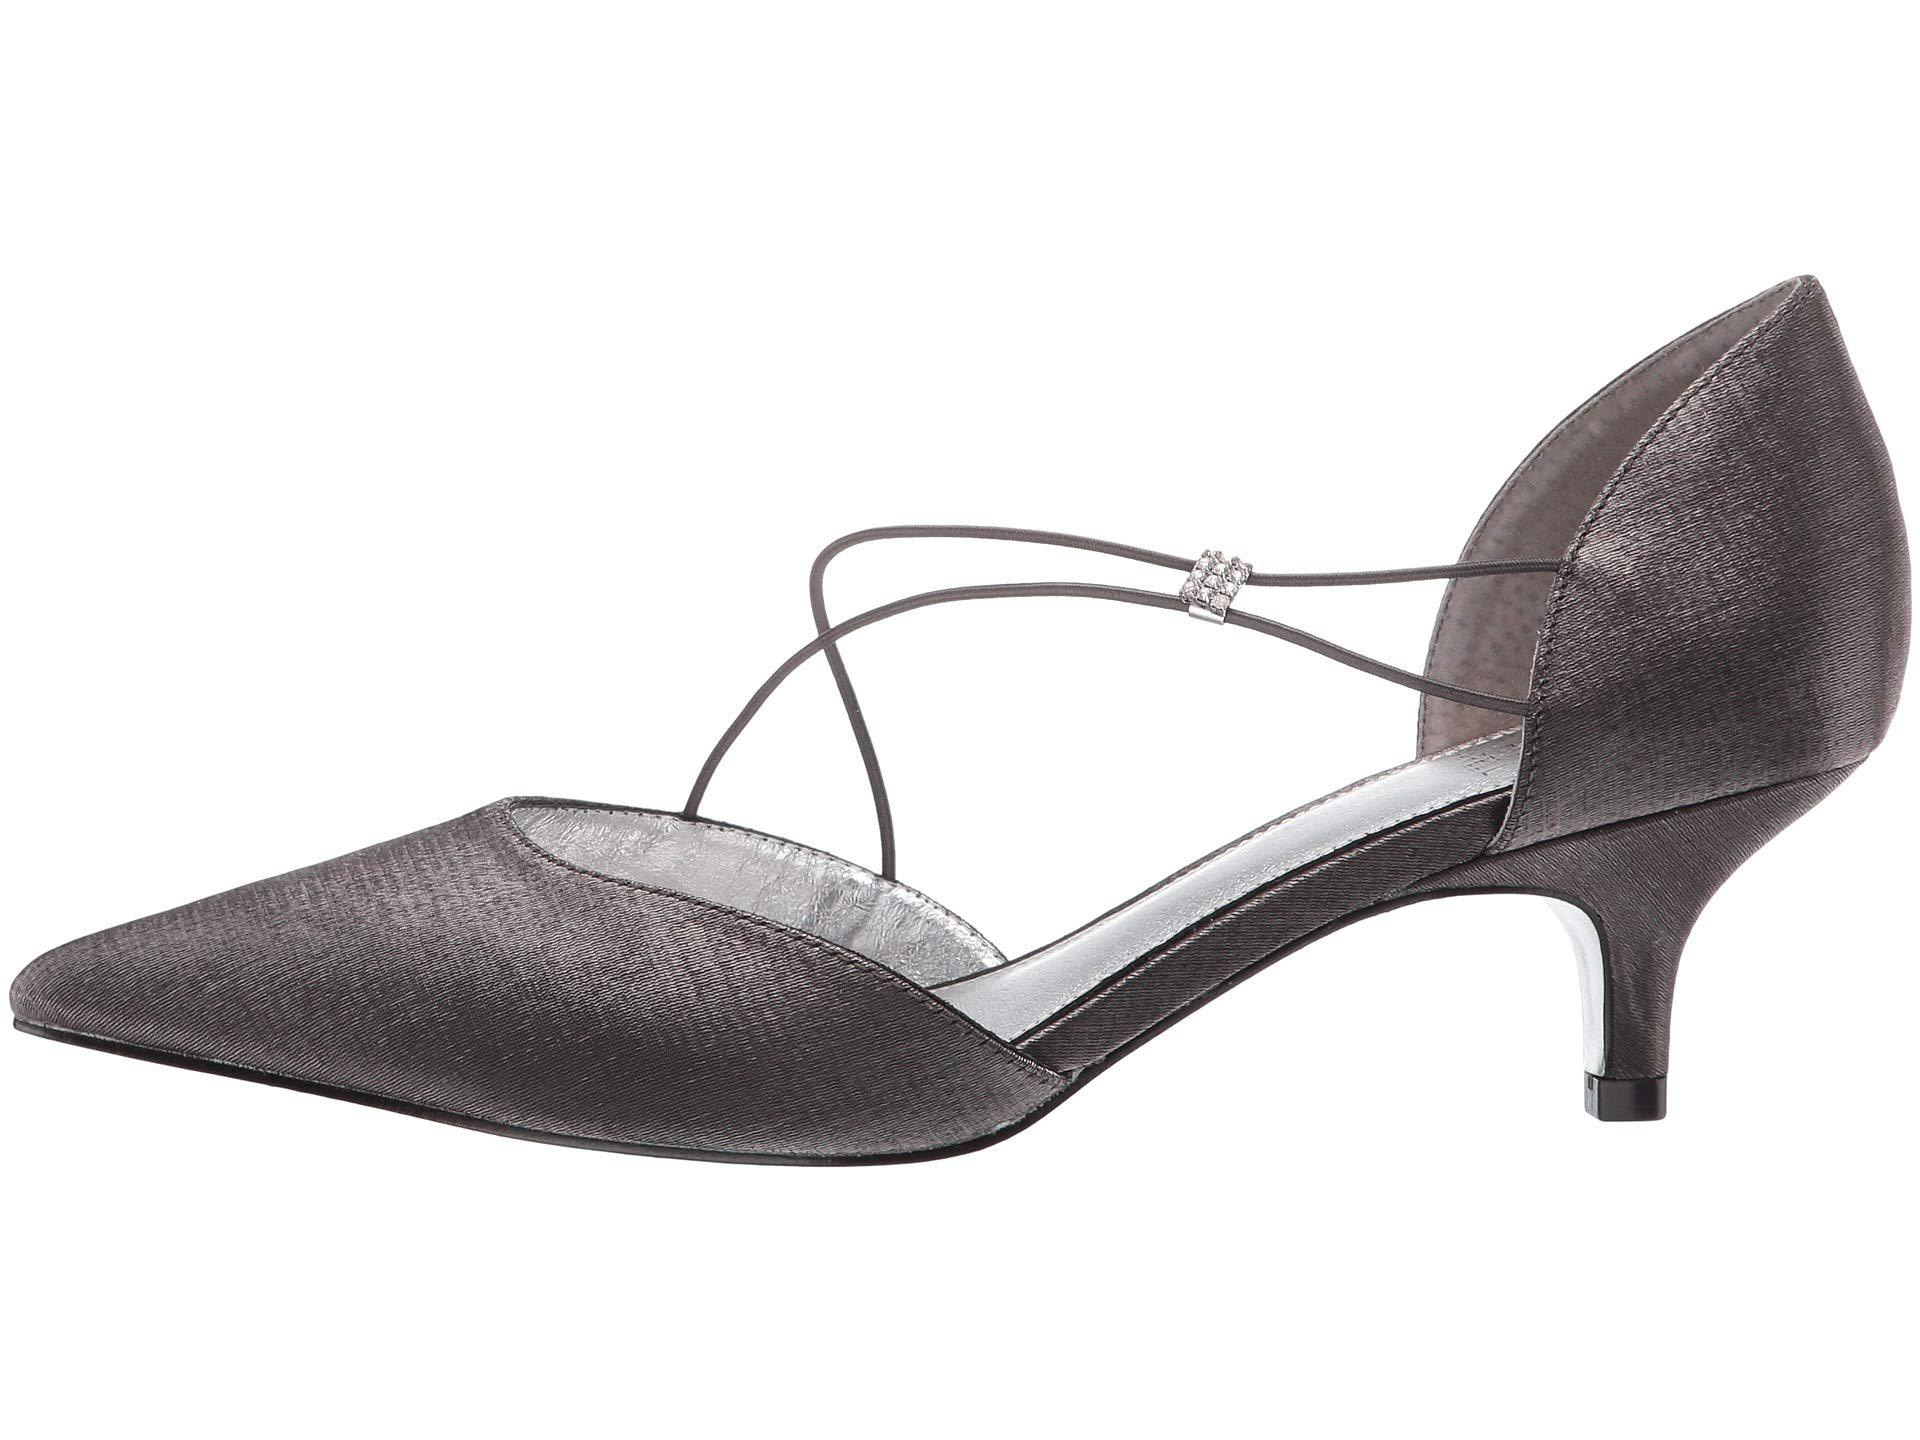 Inch Heel Shoes - Lyst